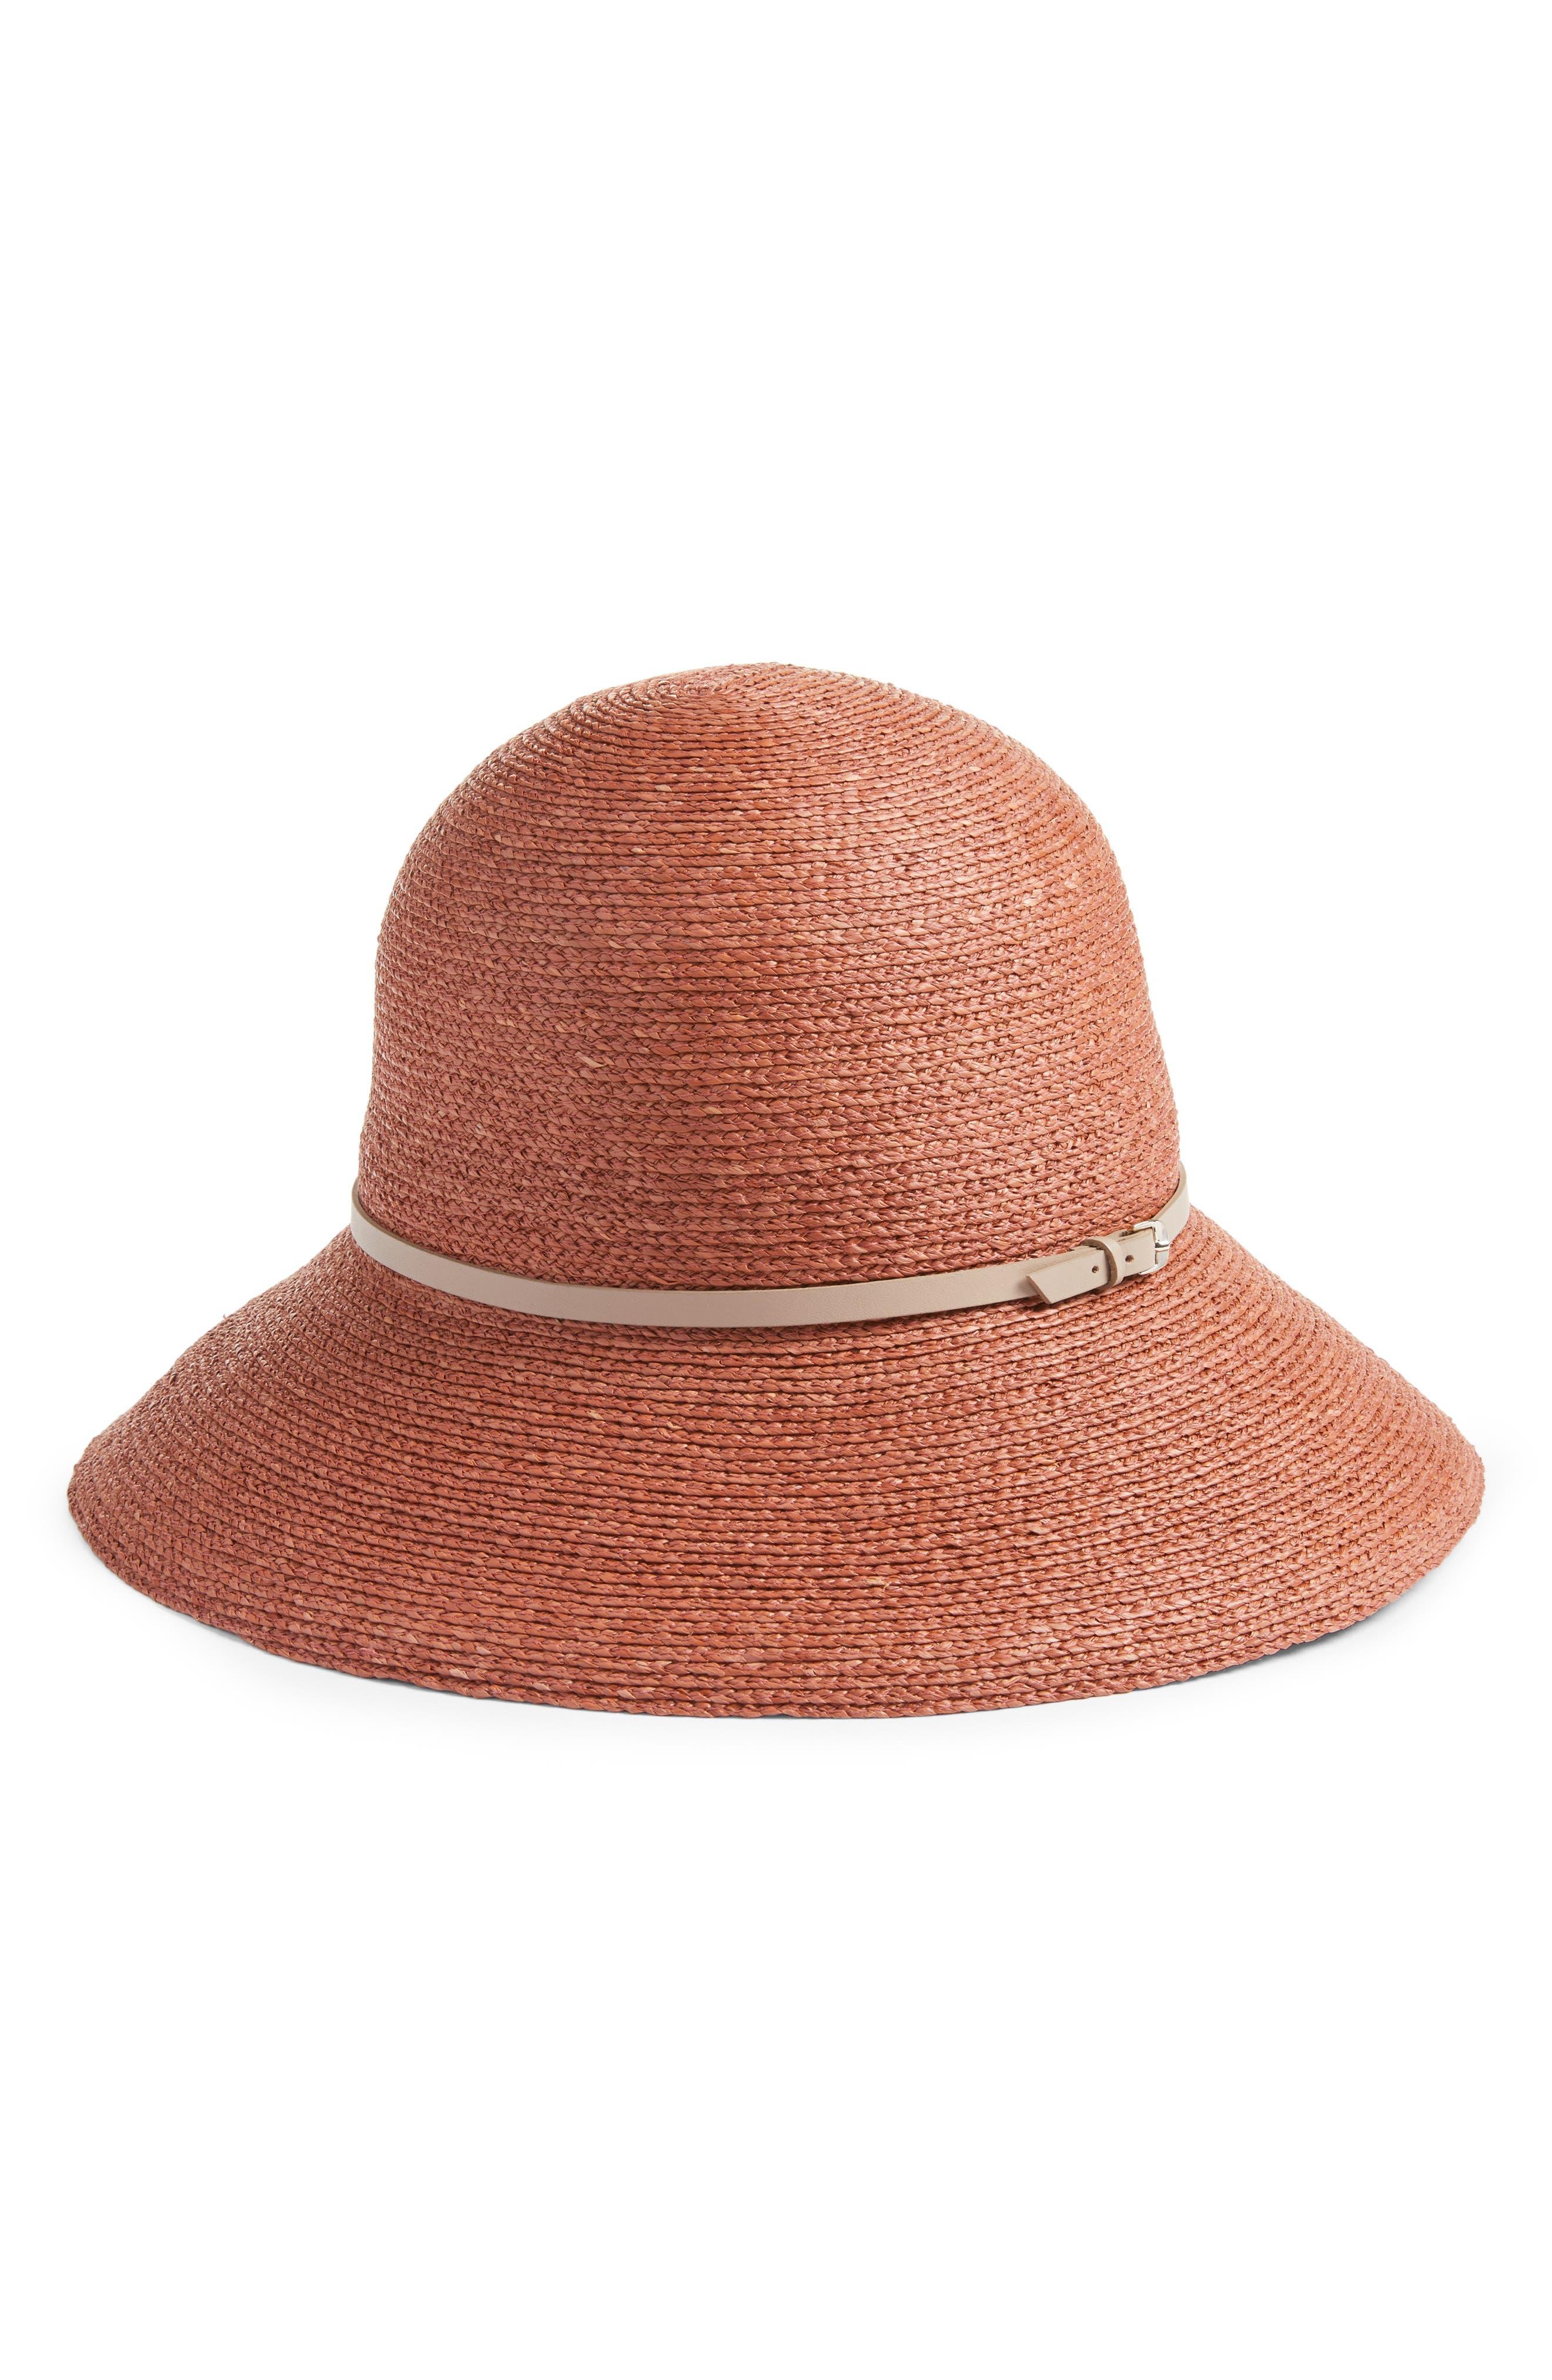 Alternate Image 1 Selected - Helen Kaminski Packable Raffia Cloche Hat